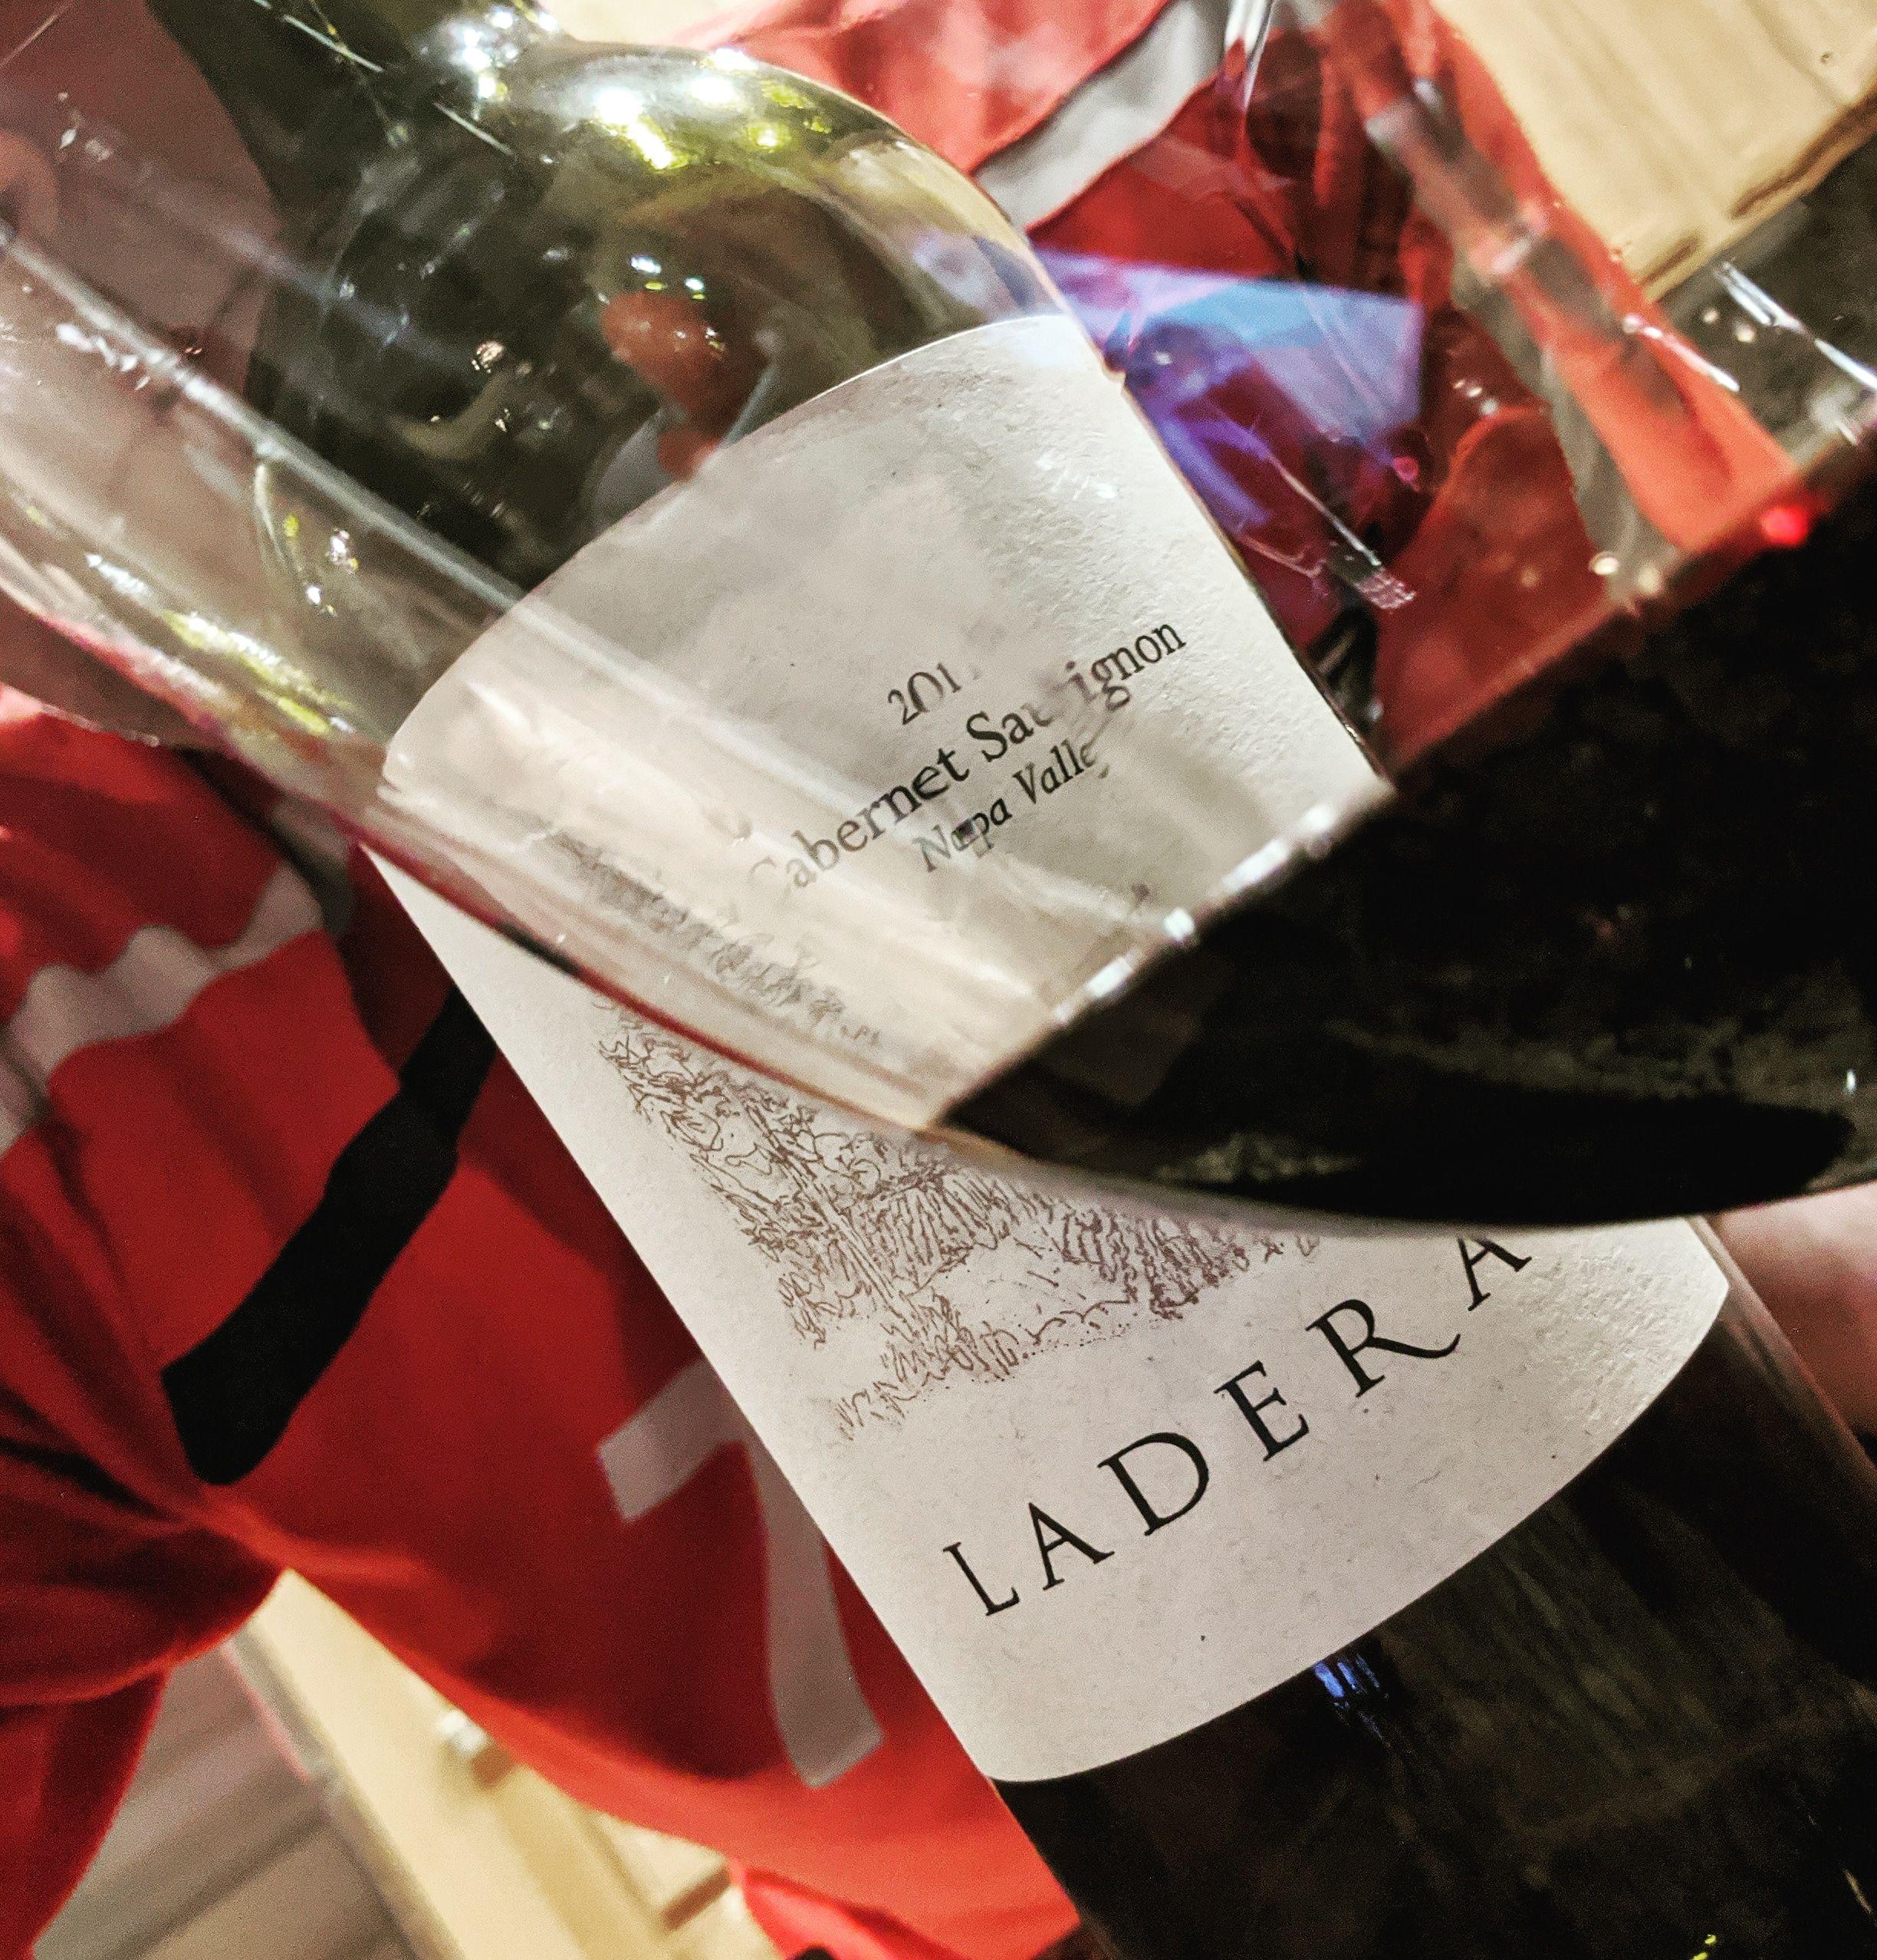 Say What Lad In 2020 Wine Bottle Rose Wine Bottle Sayings